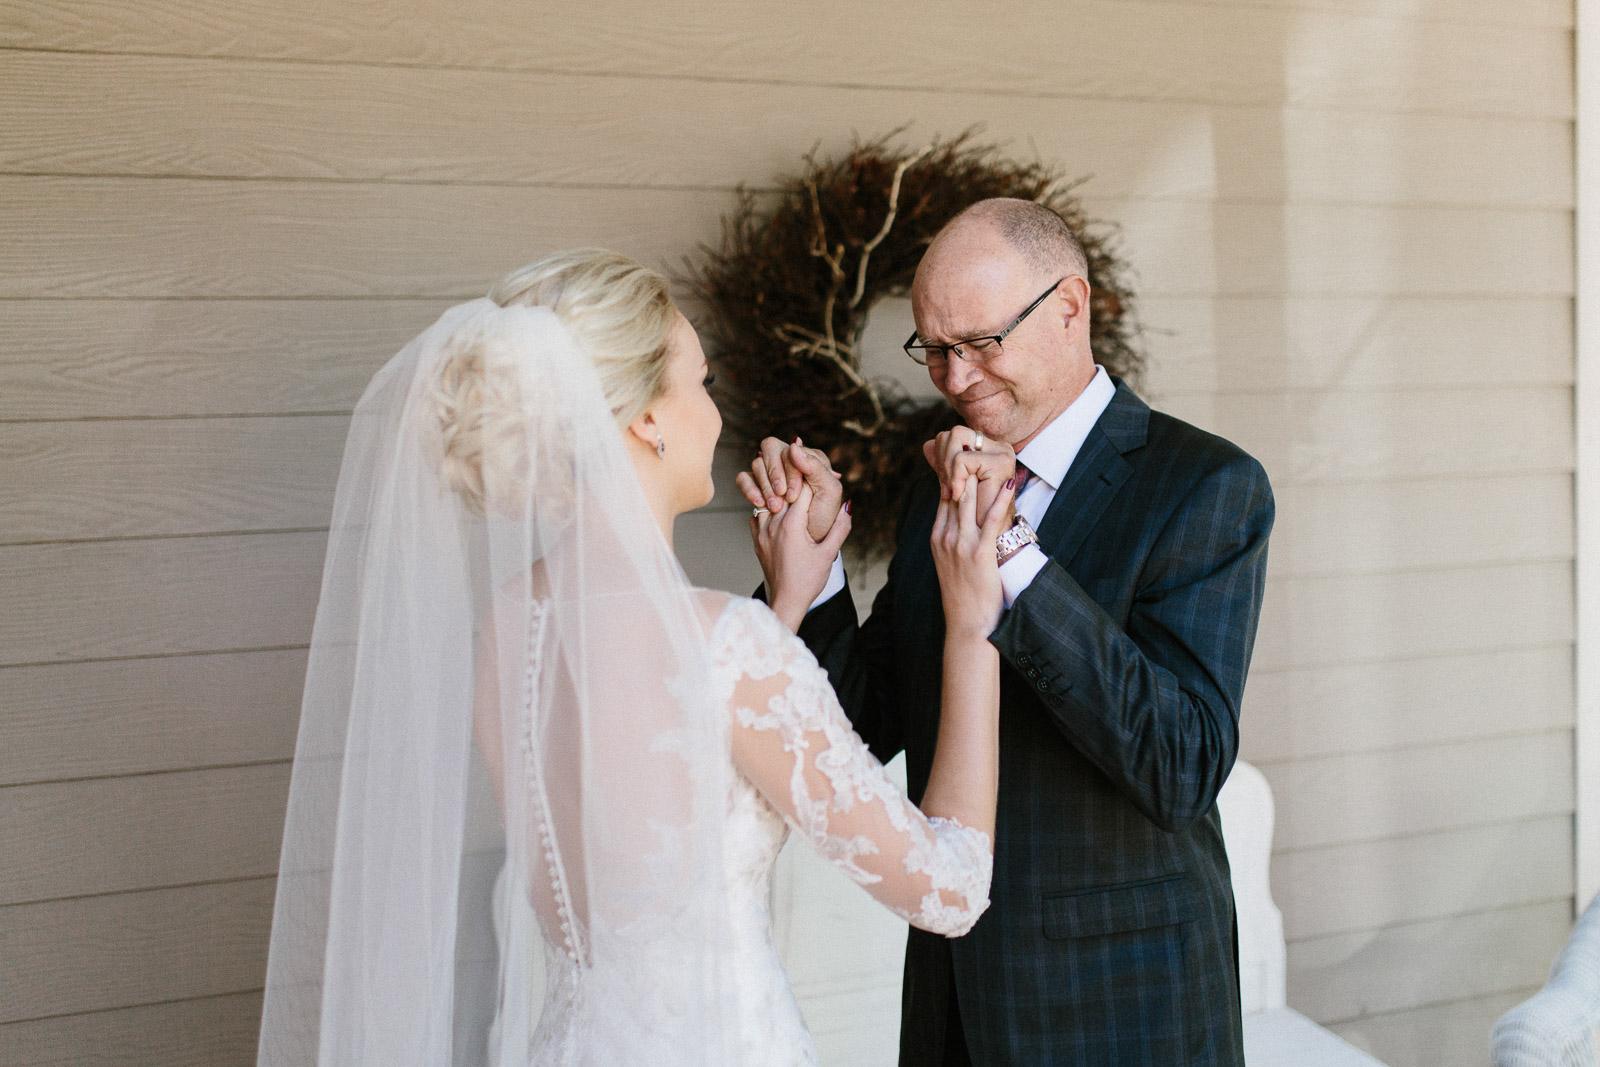 Jenna&Austin_SiouxFalls_Wedding_Photographer_029.jpg